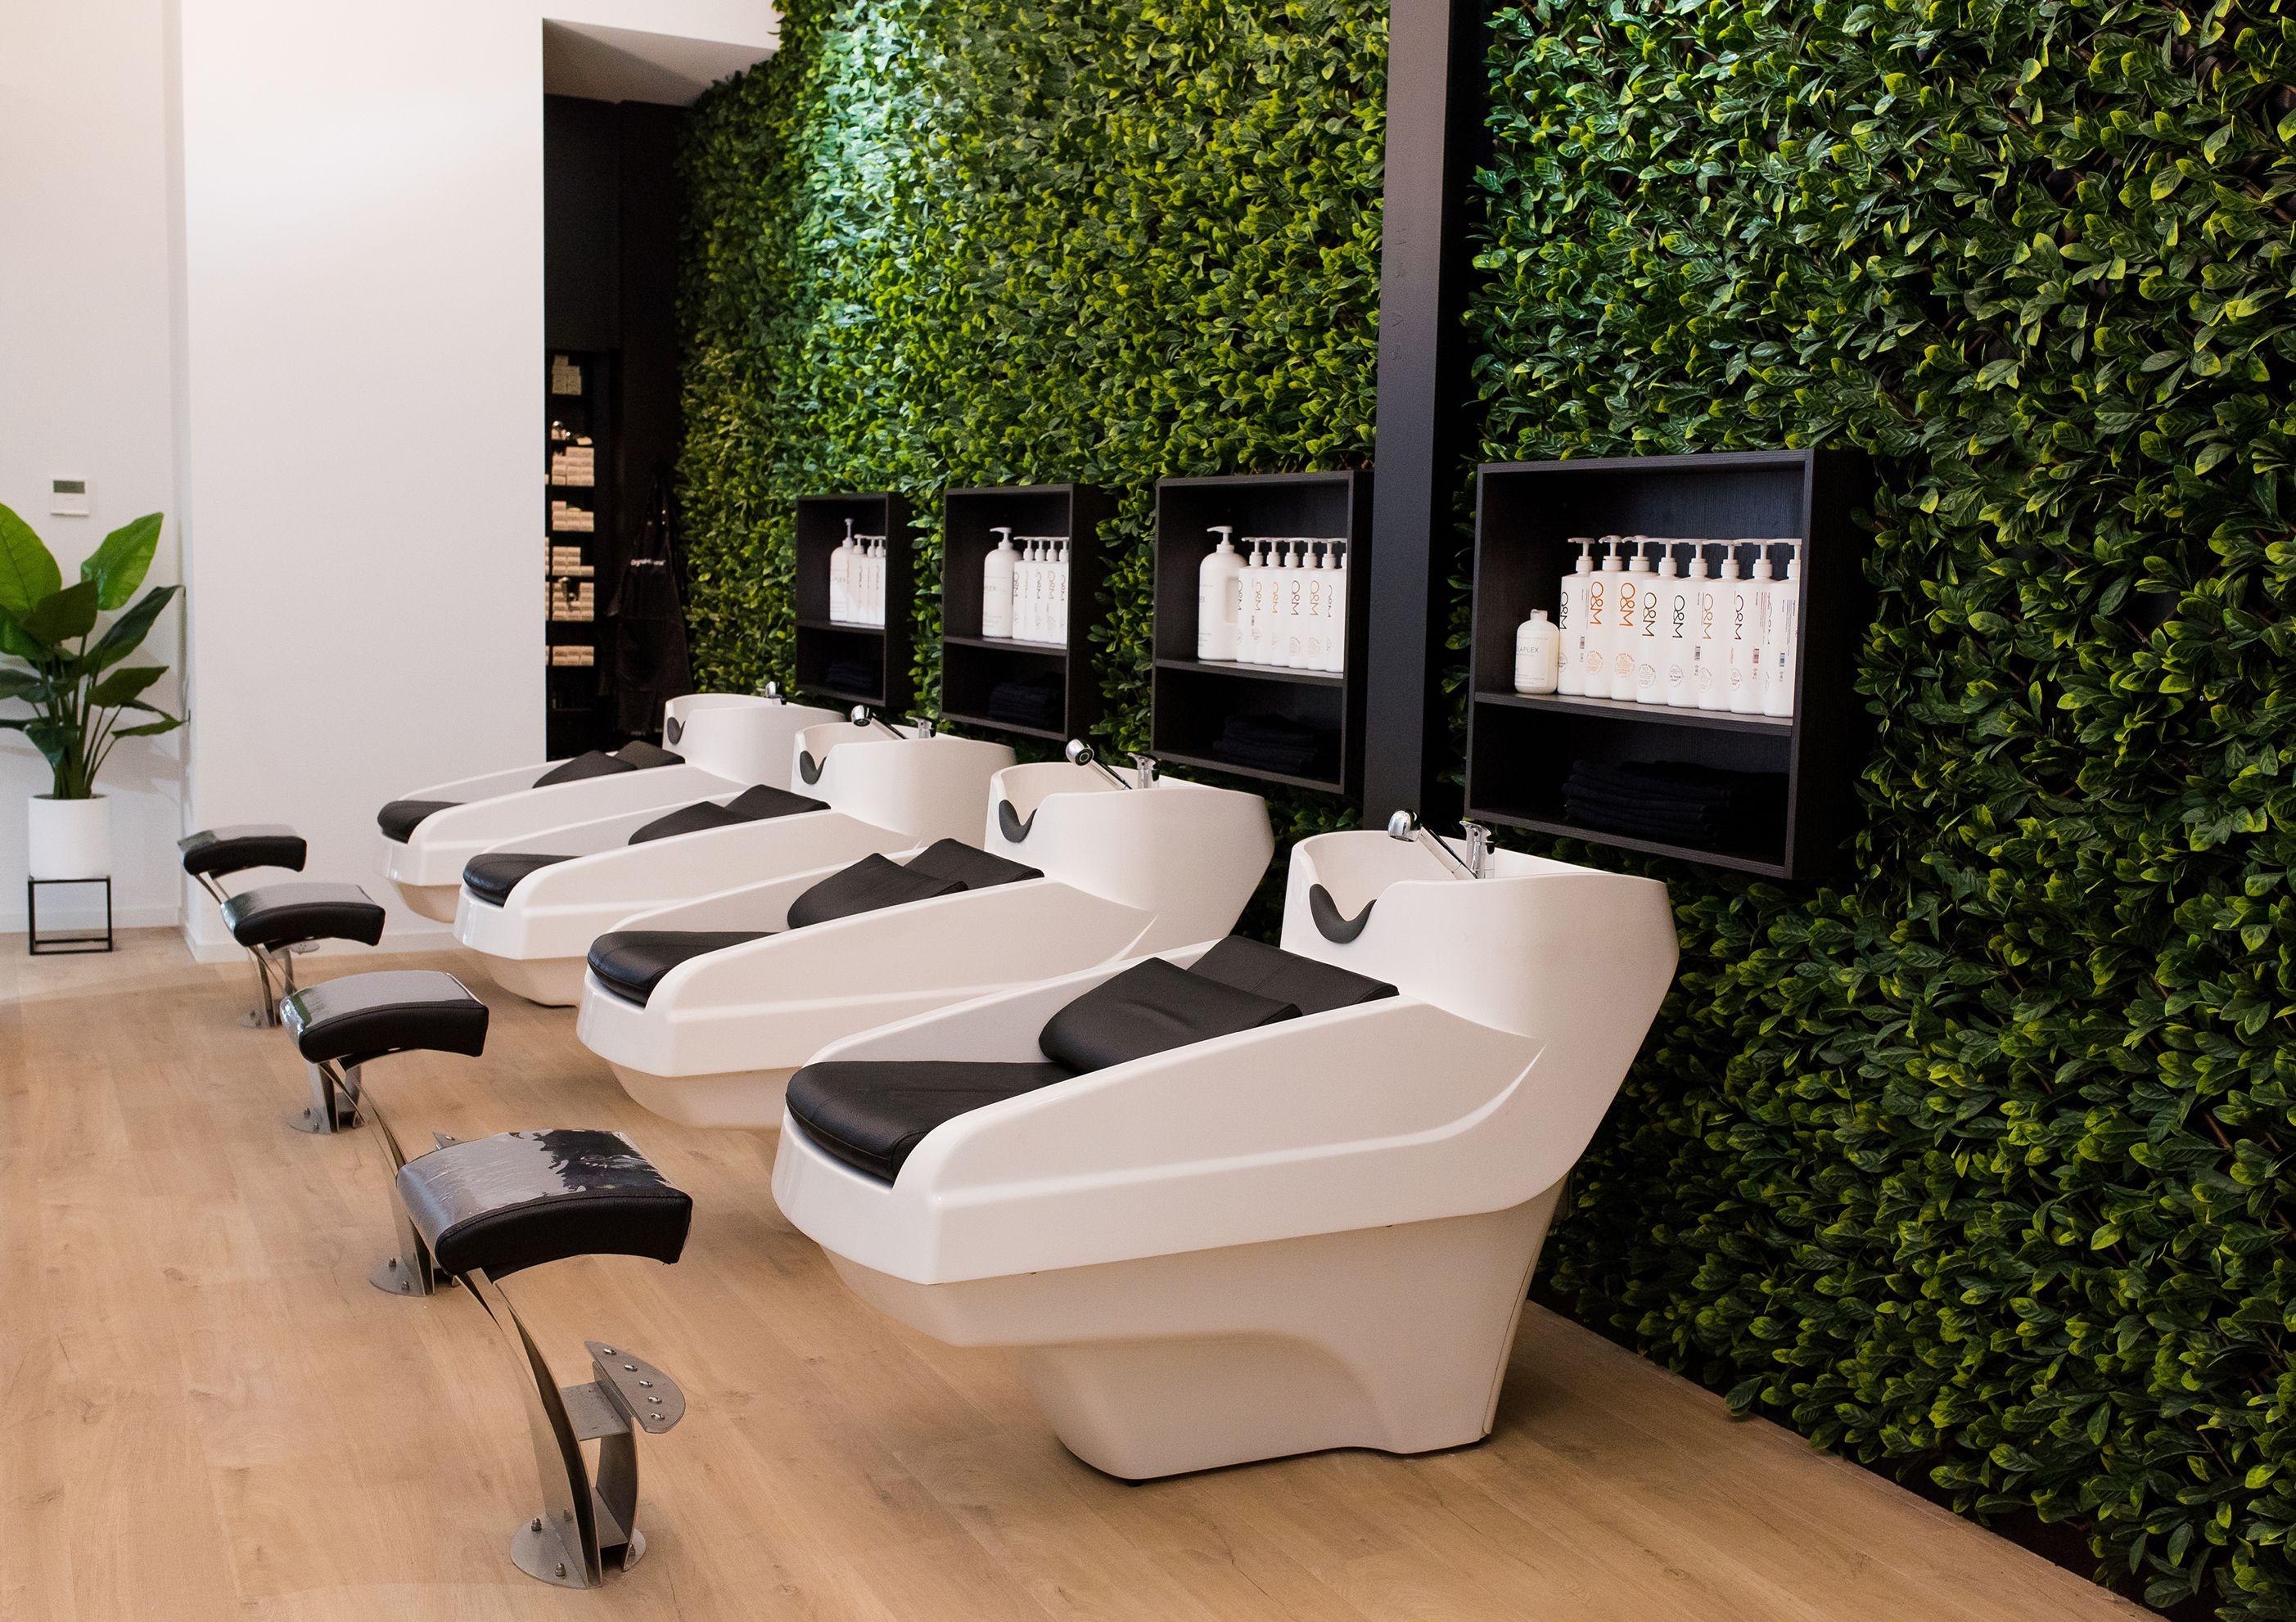 salon ideas beauty, salon reception, beauty salon design